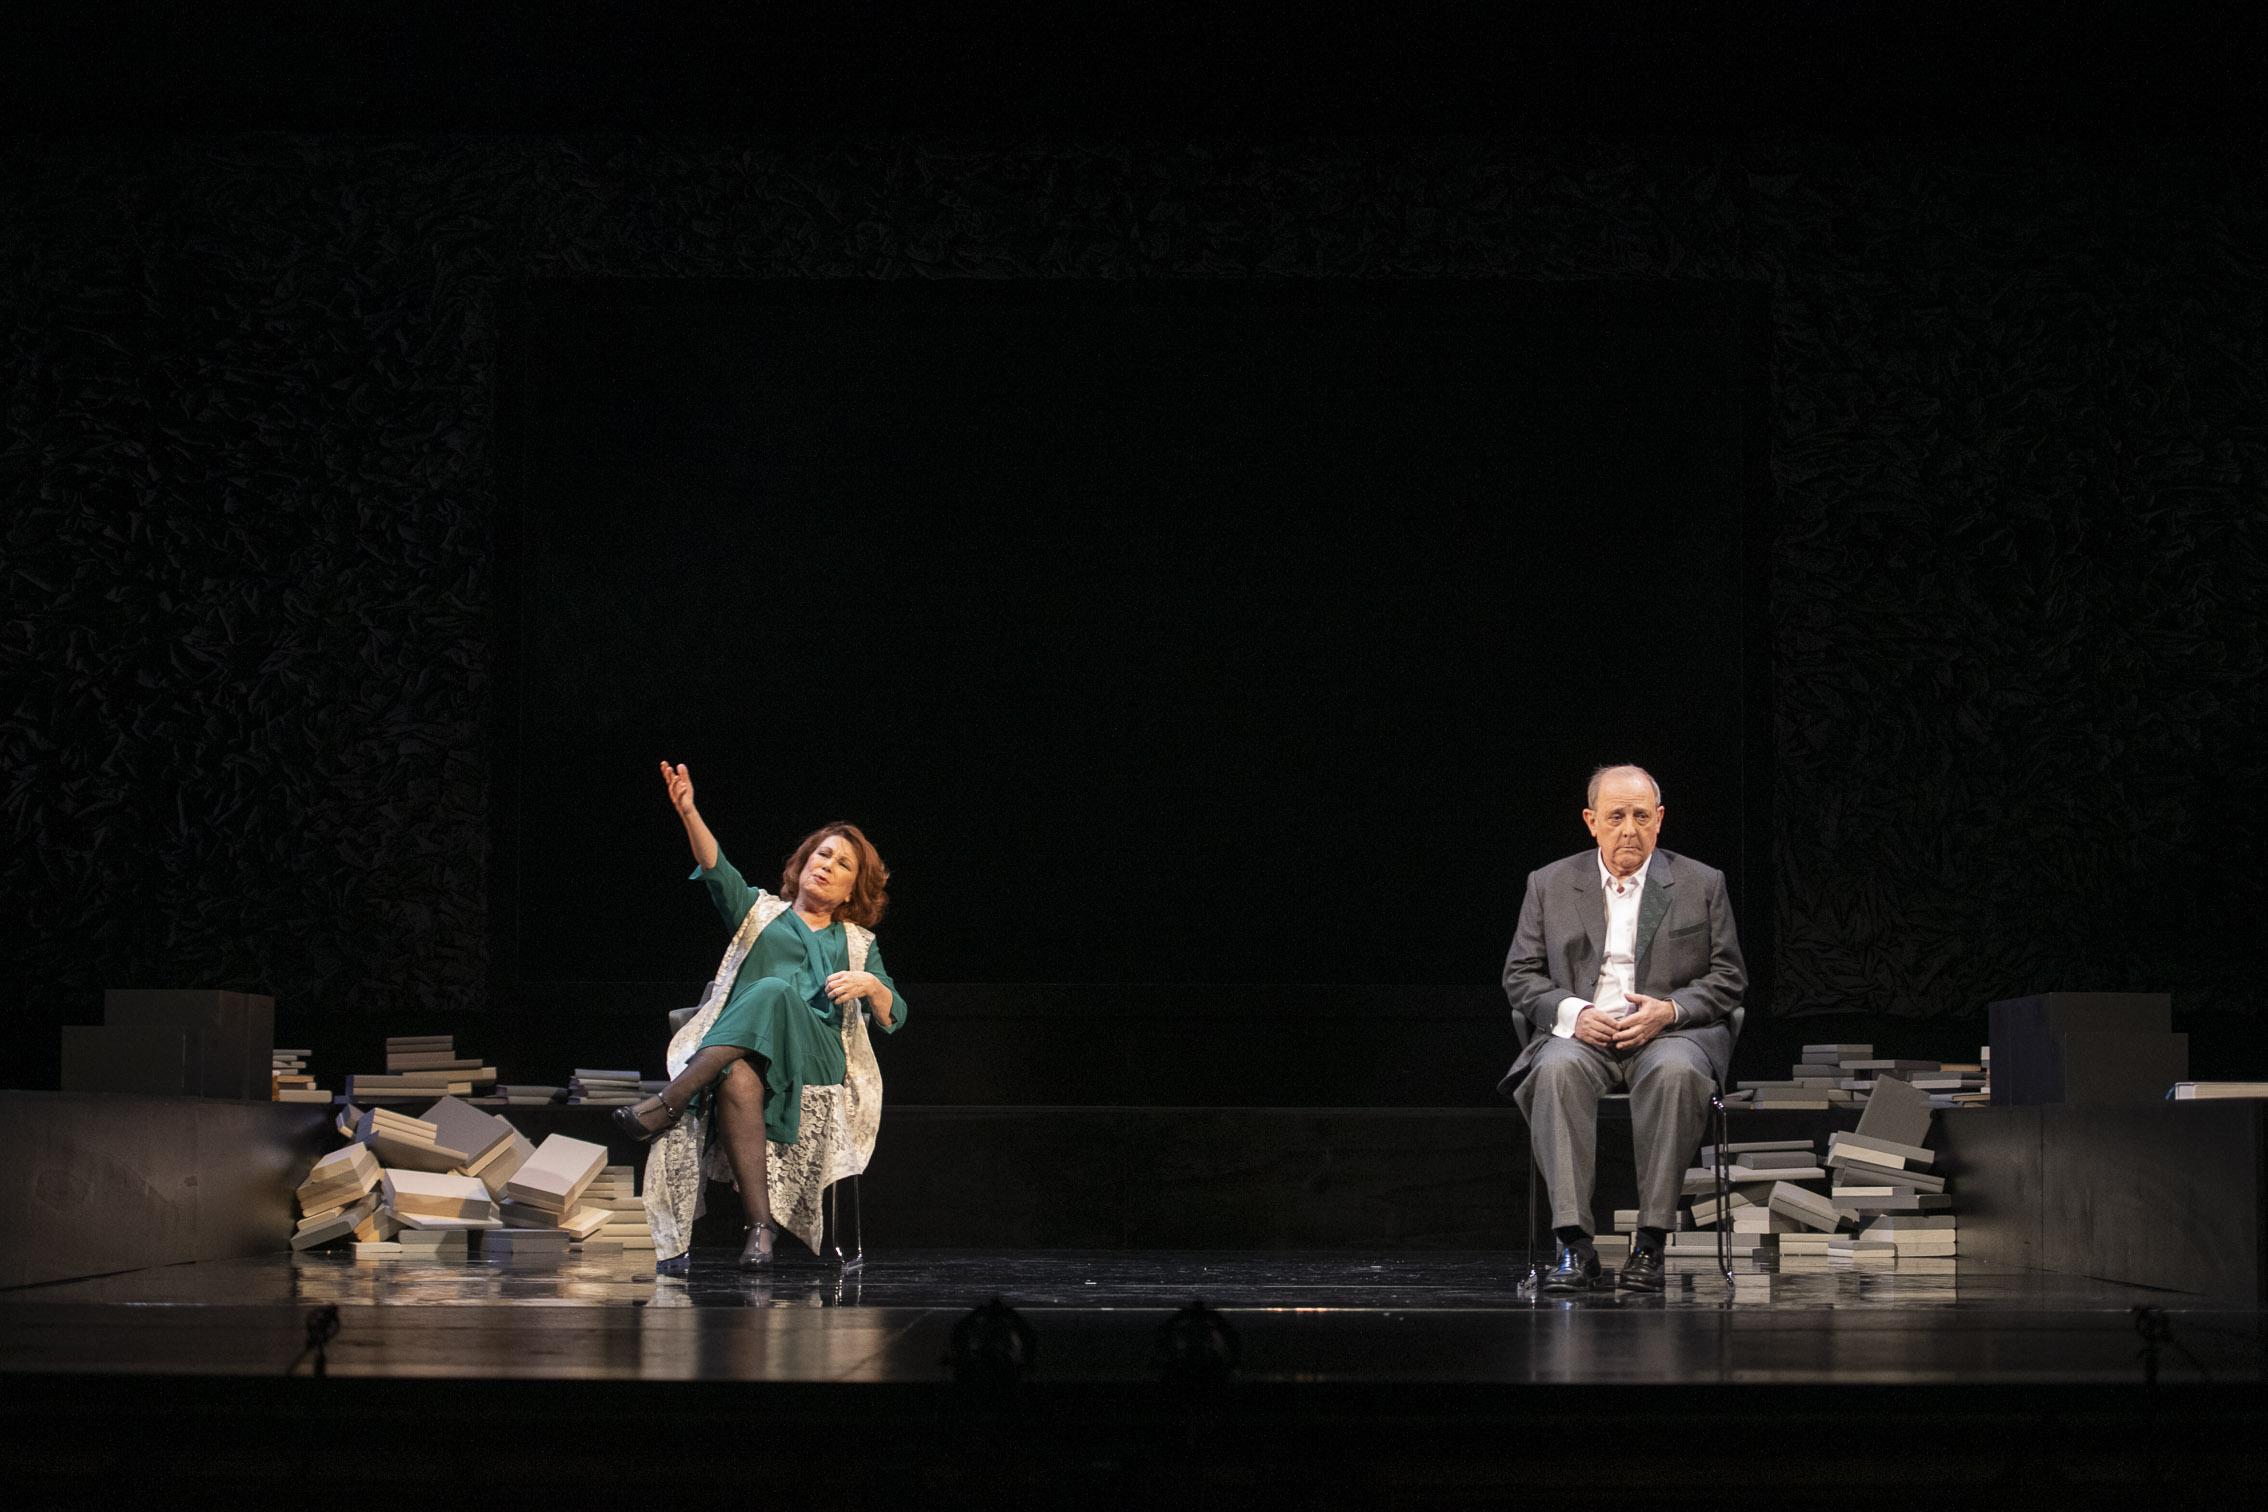 El Teatro Pérez Galdós estrena Galdós enamorado